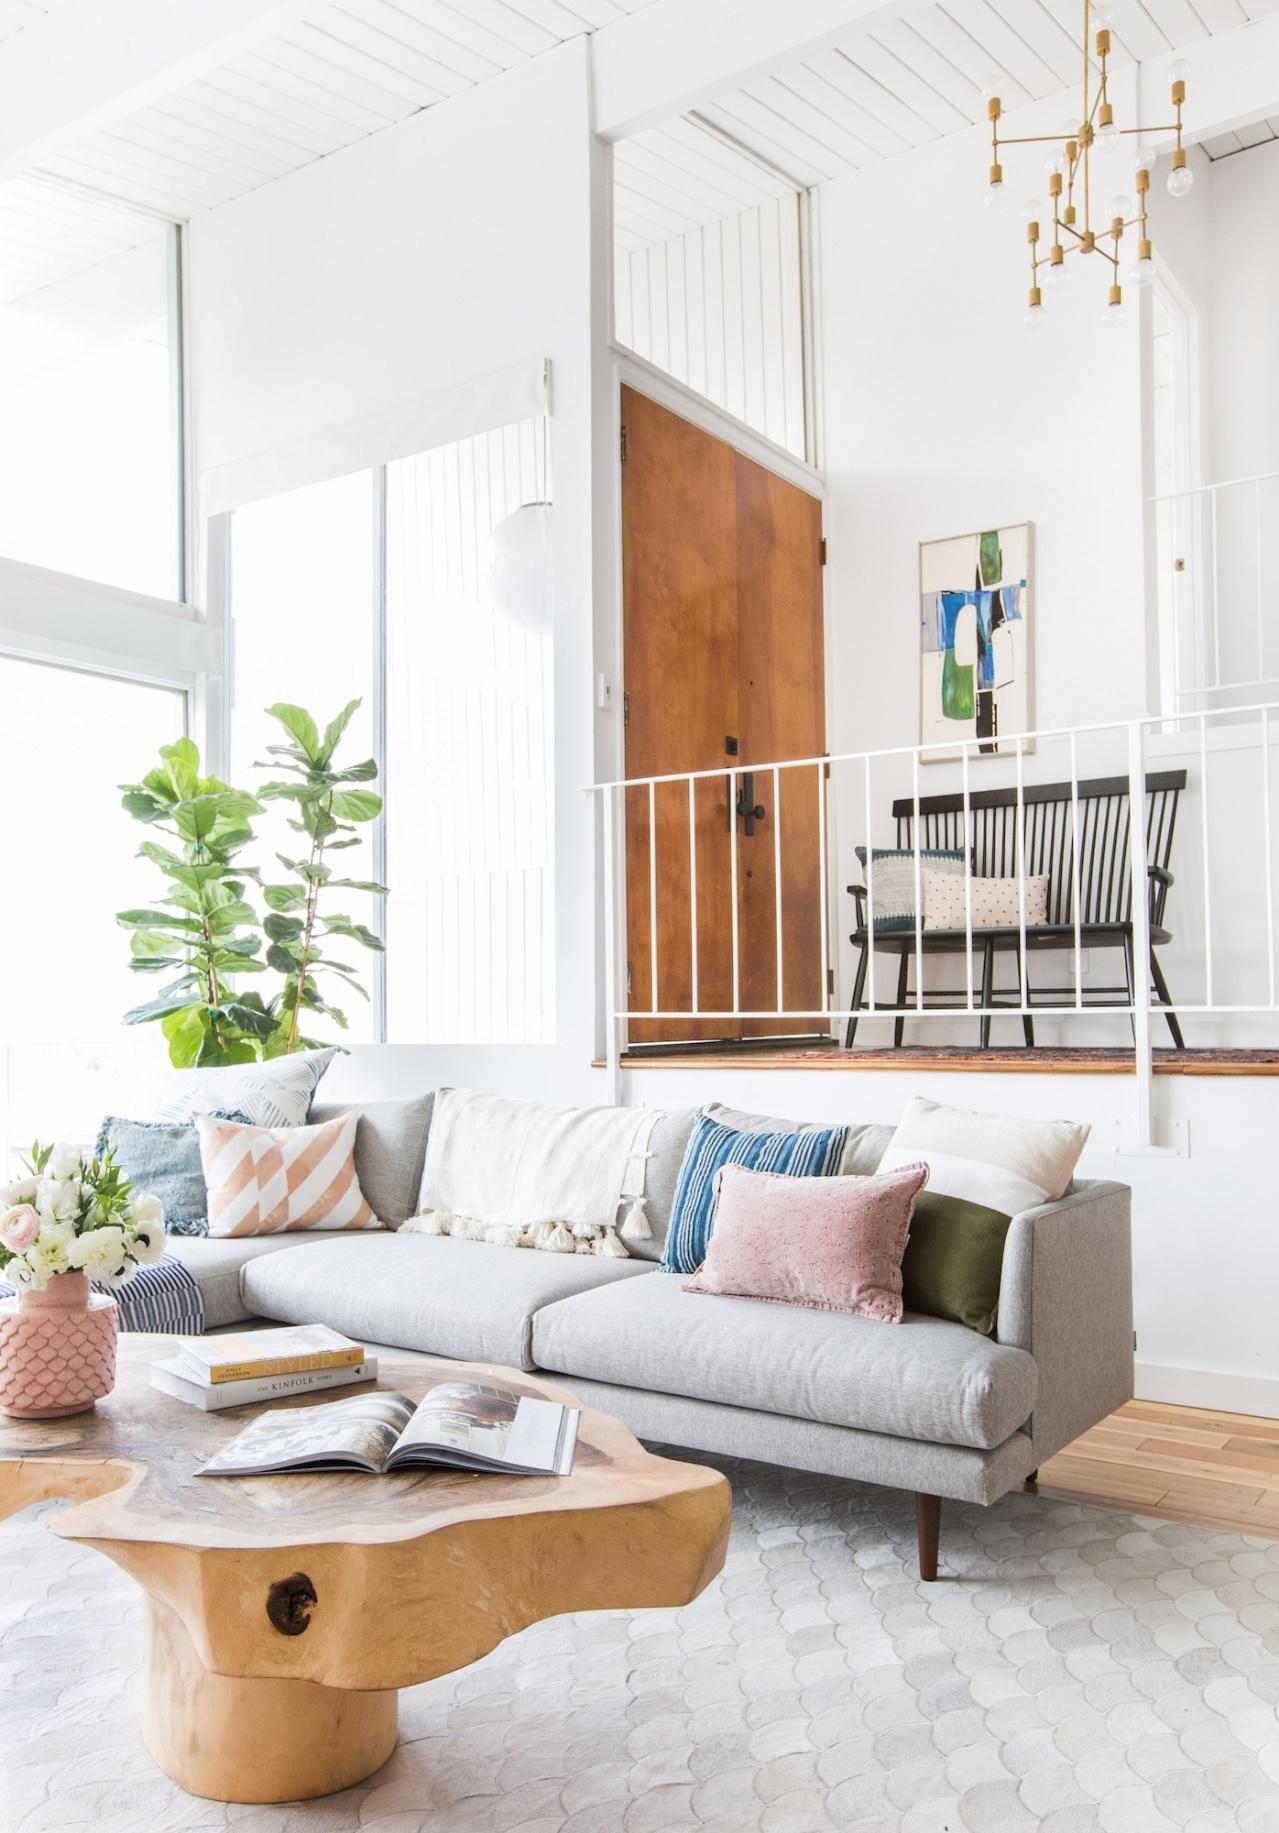 emily henderson | Home Design Ideas